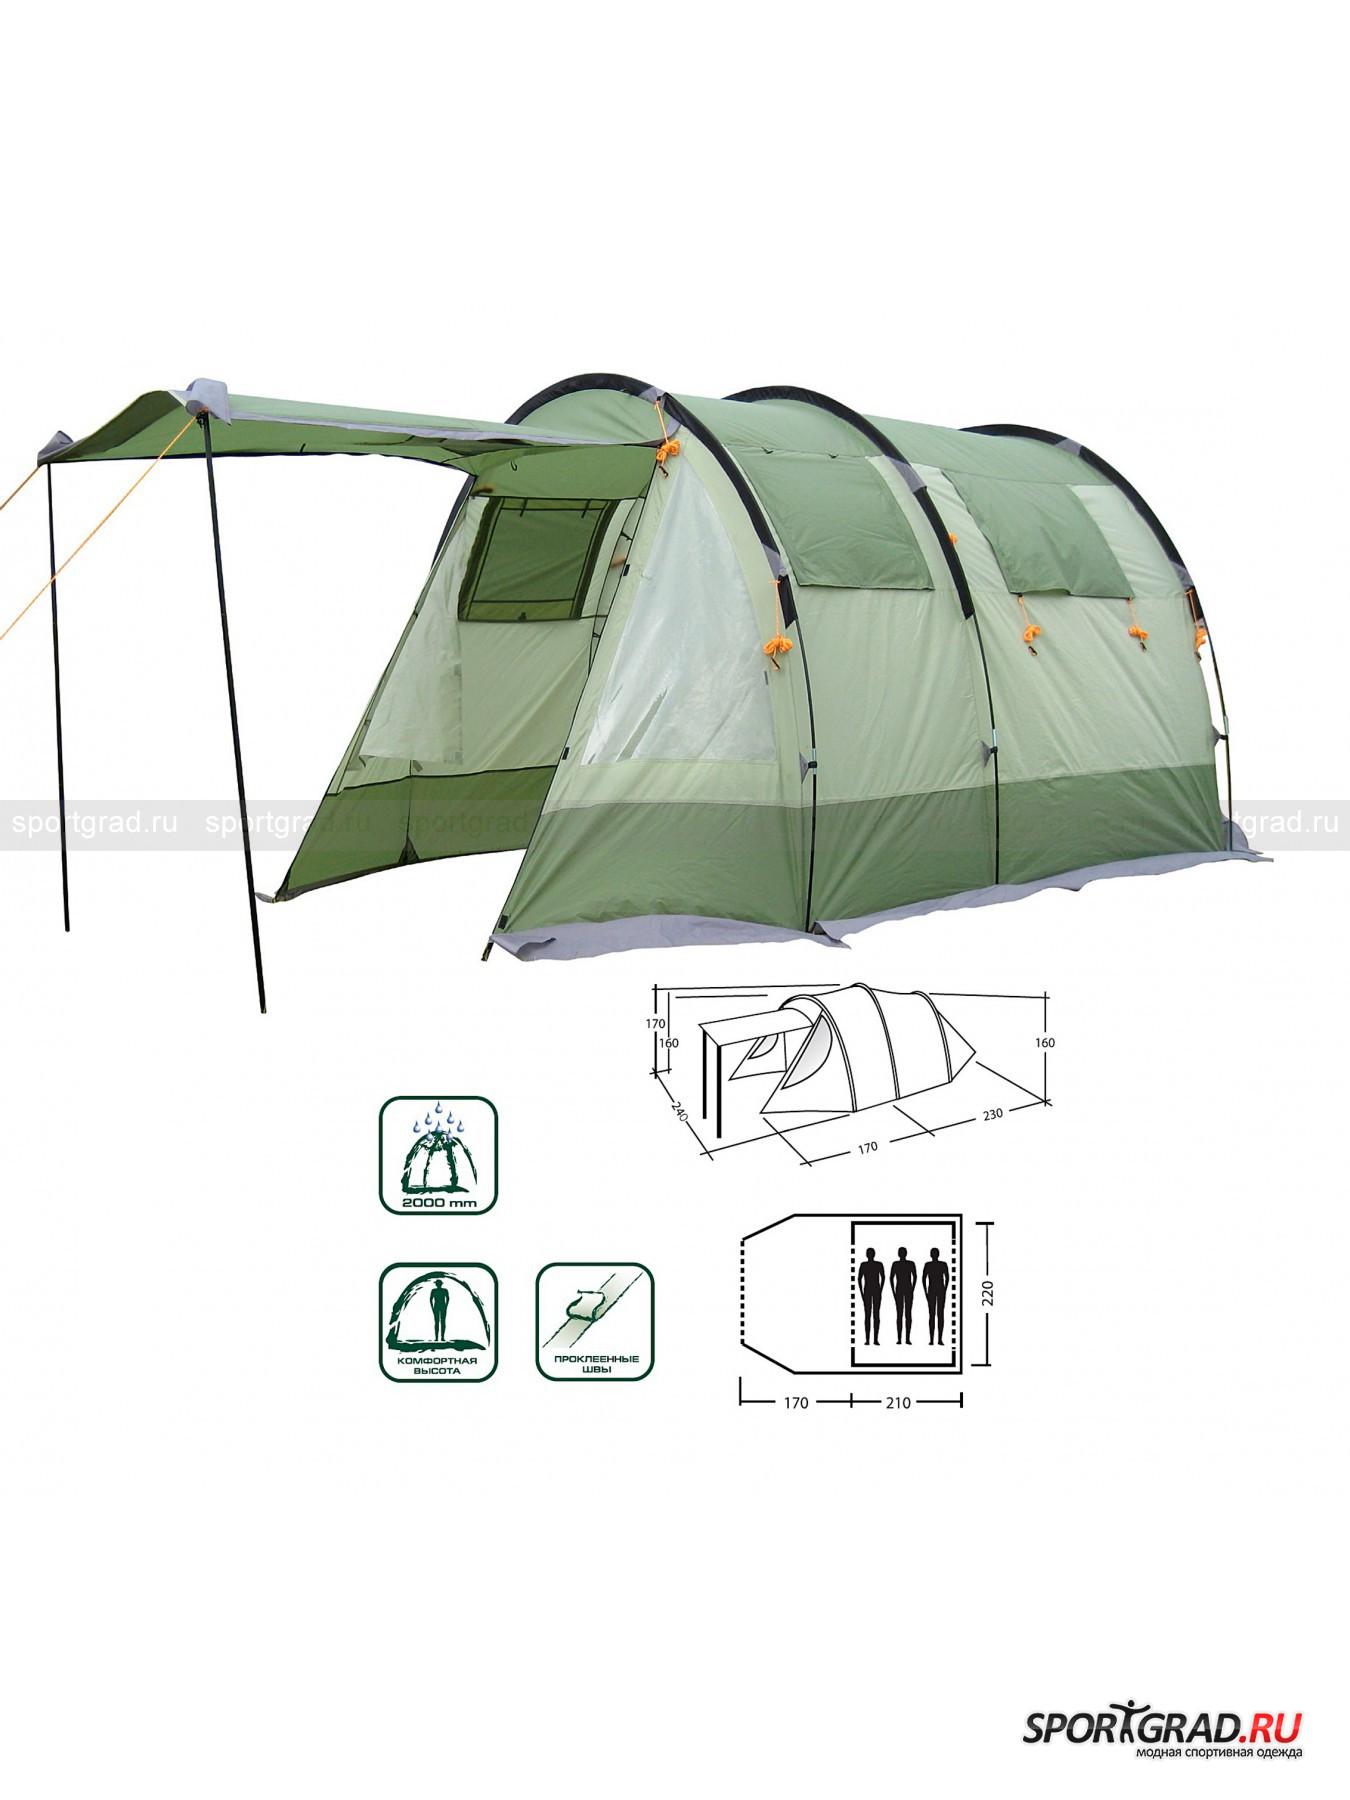 Палатка Varda 300 MOON CAMP от Спортград